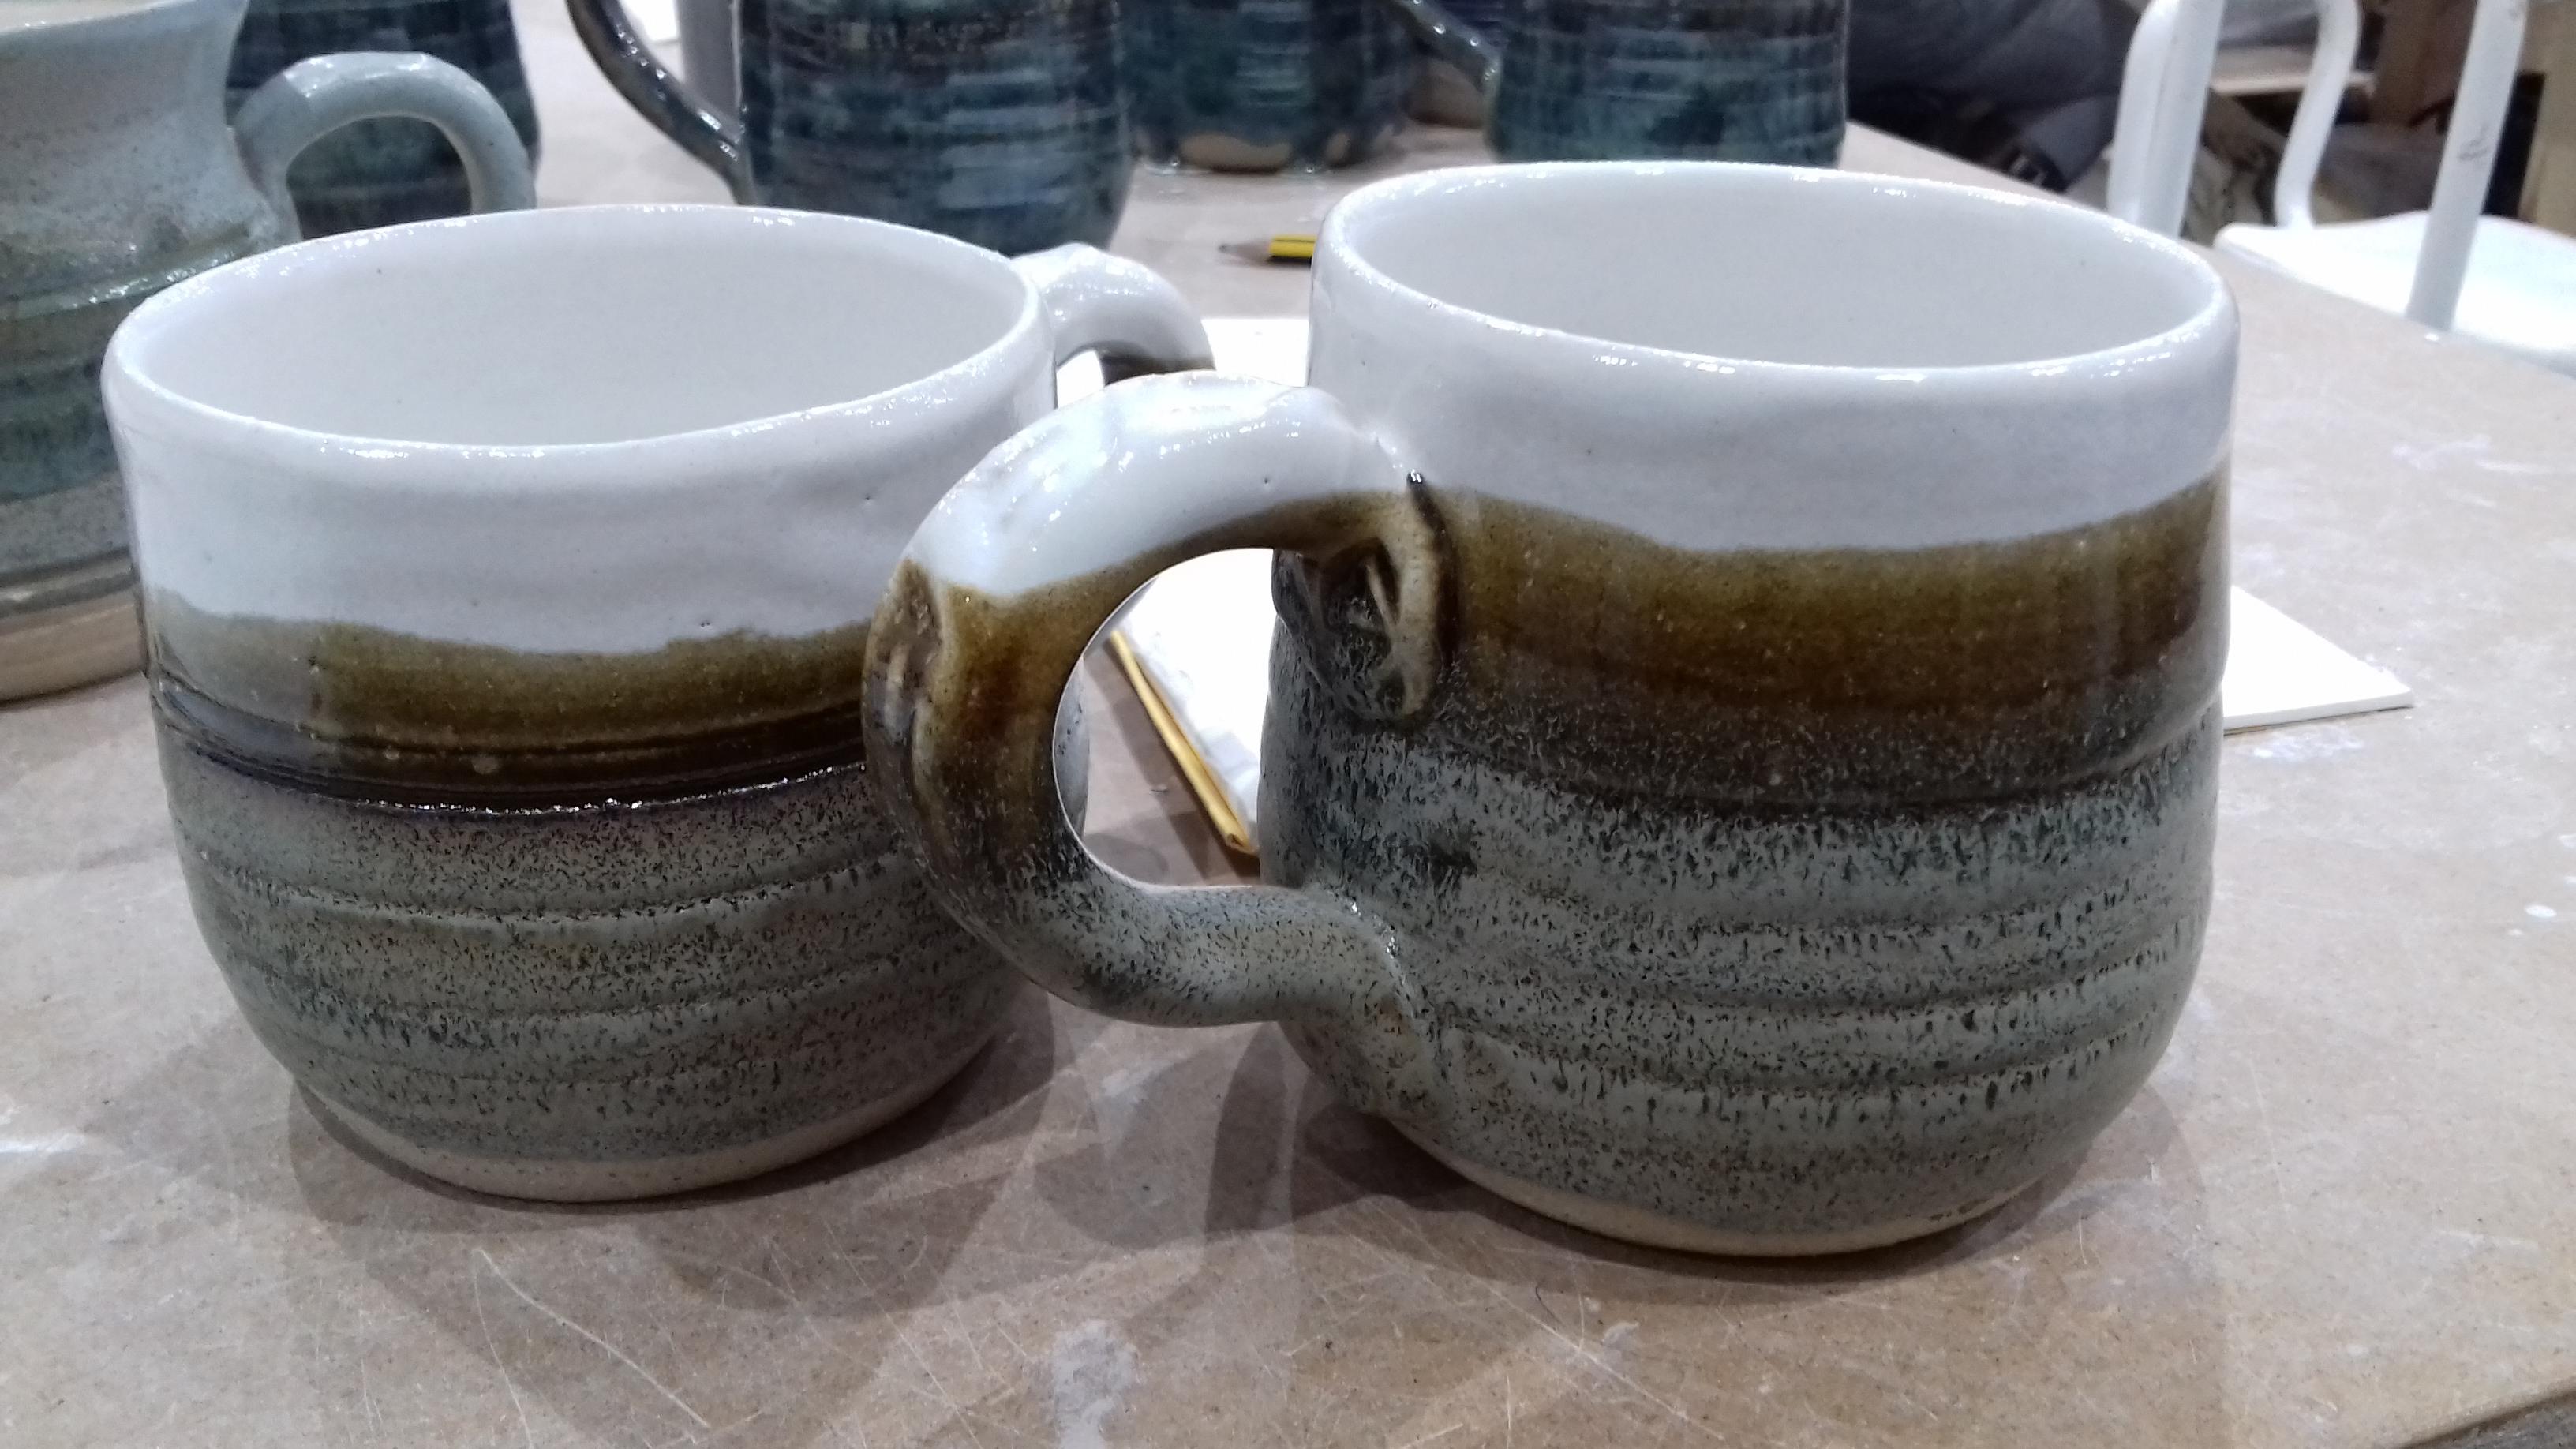 Nice overlapping glazes